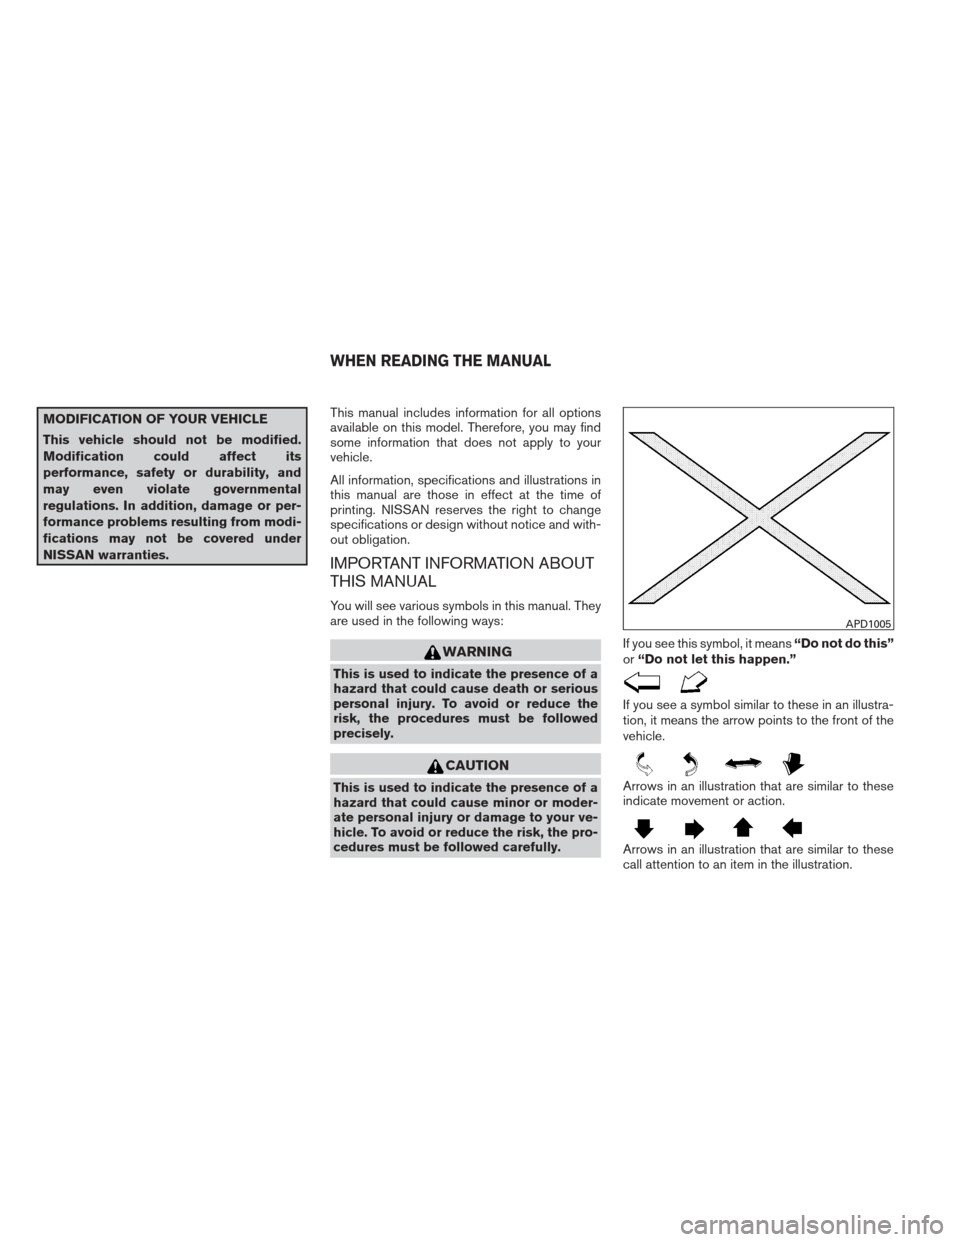 diamante fuse box diagram likewise 2004 nissan pathfinder fuse box